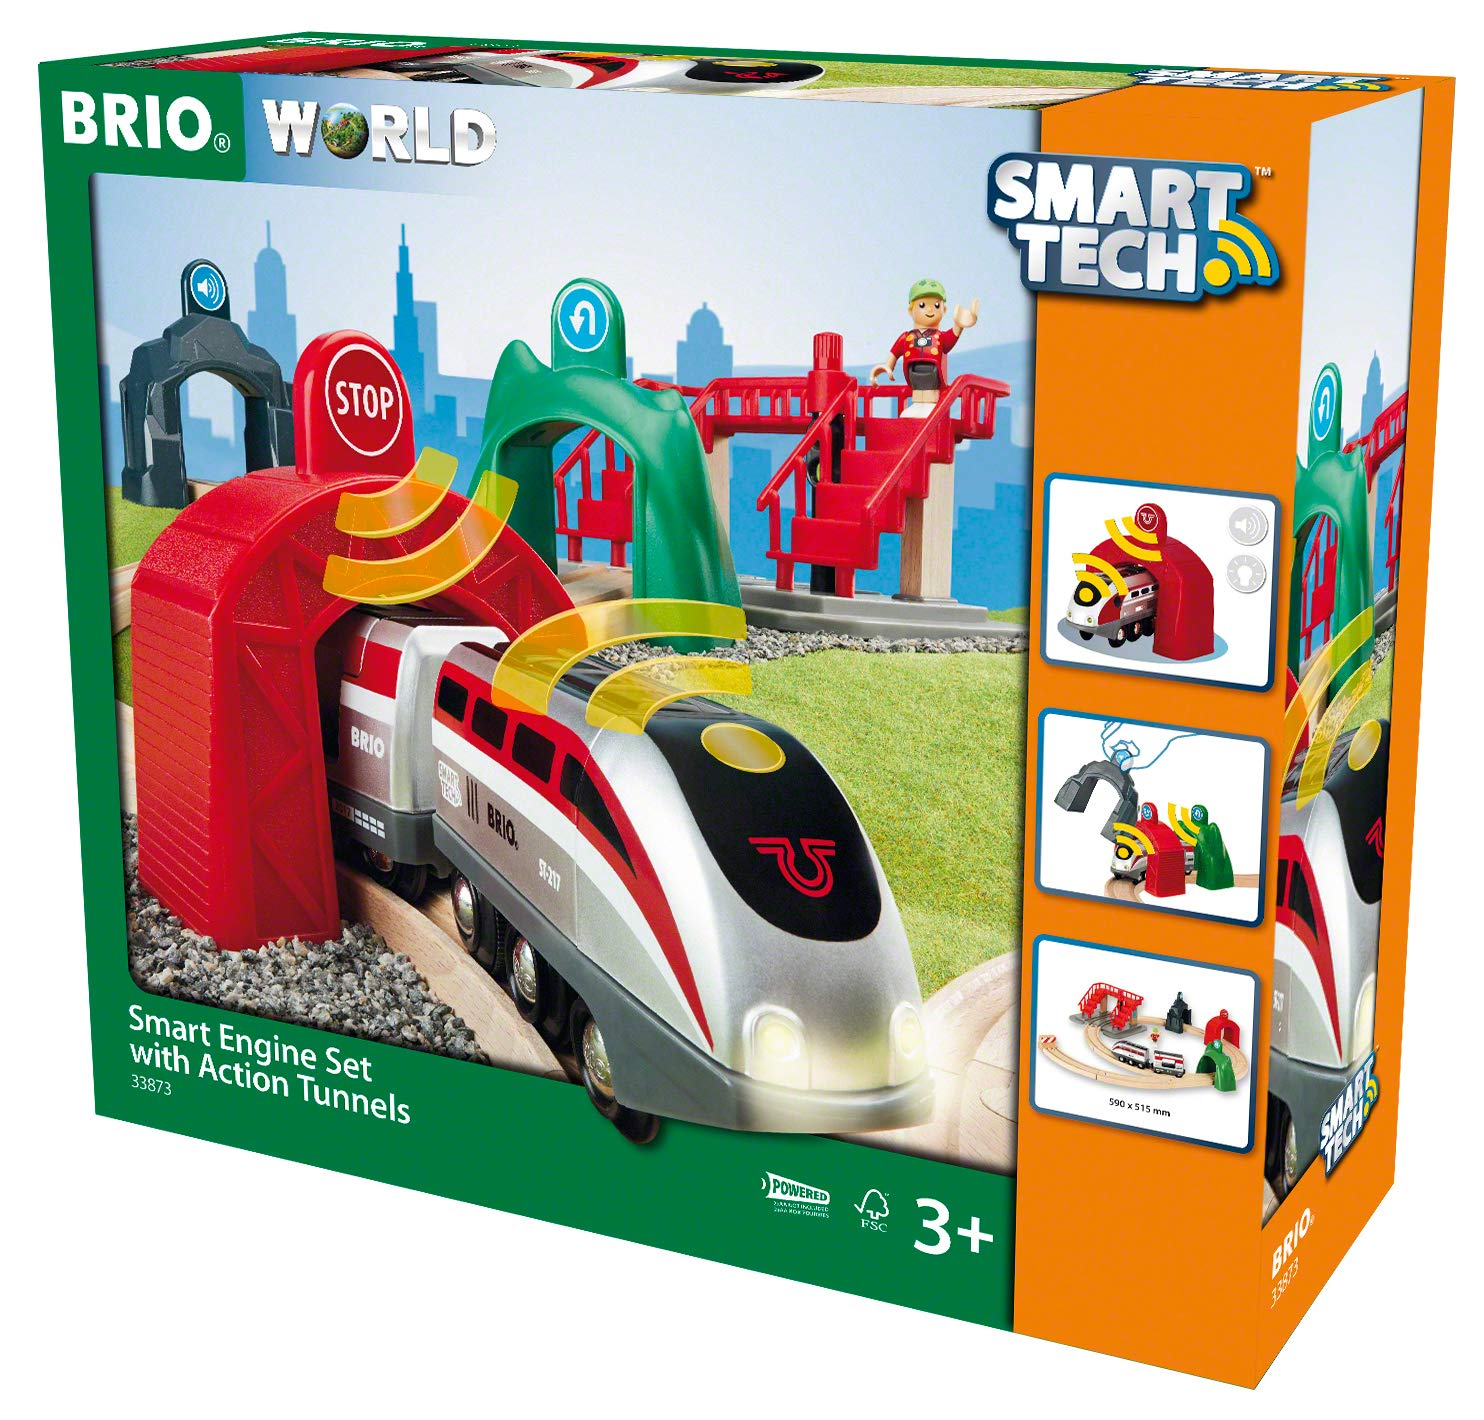 BRIO World - Smart Tech Railway - Engine Set With Action Tunnels 33873